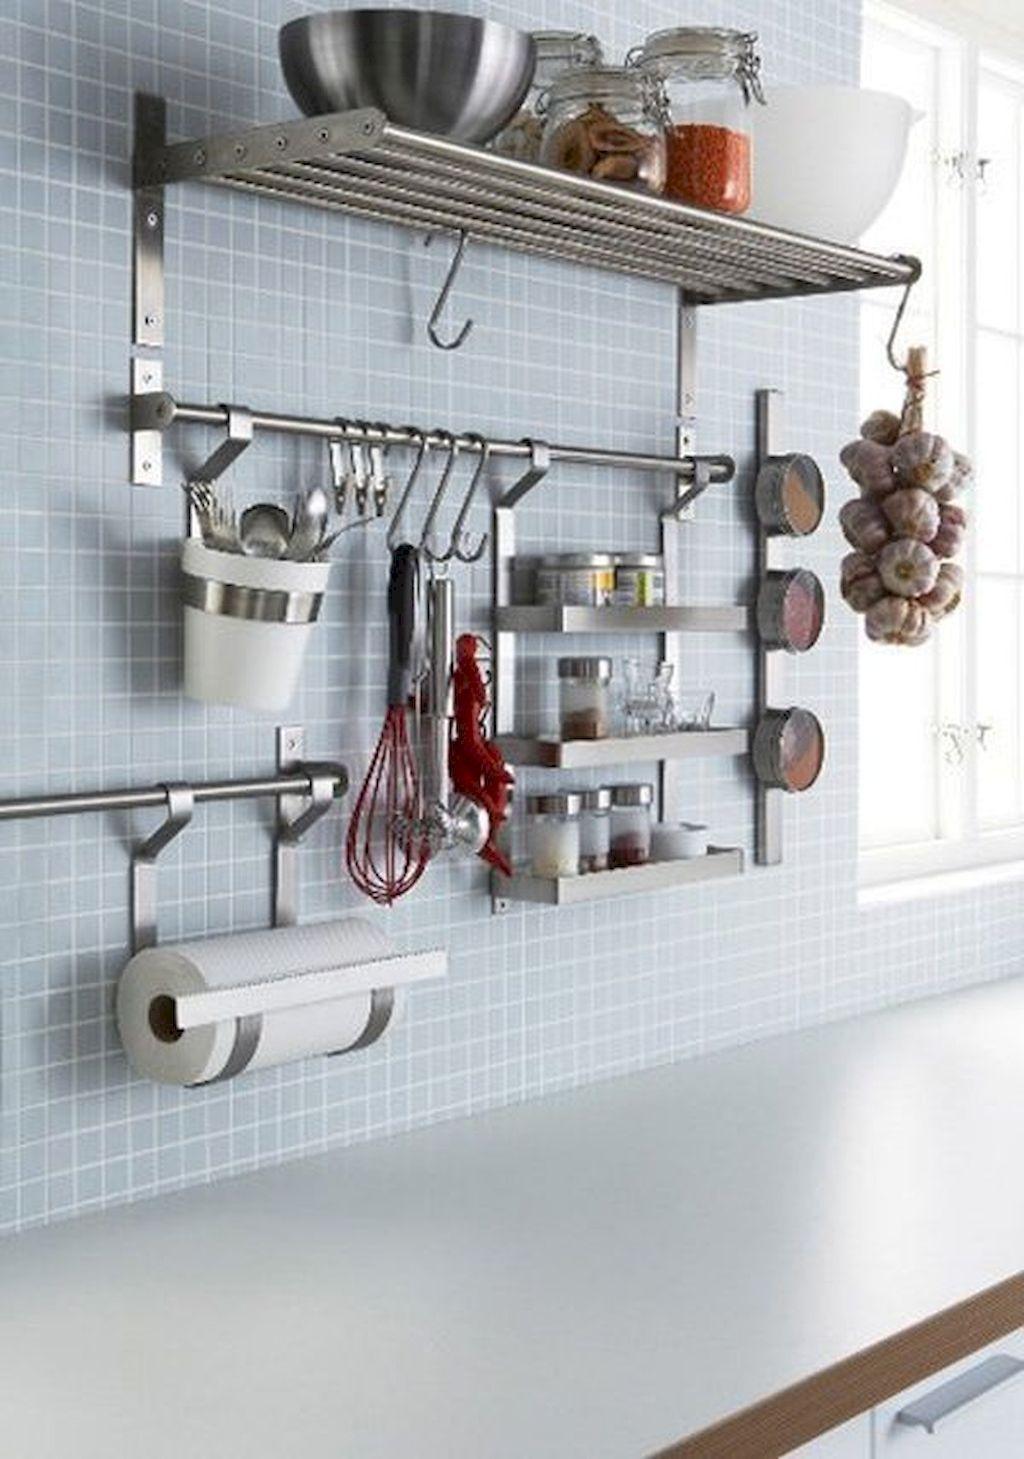 70 Surprising Apartment Kitchen Organization Decor Ideas 57 Home